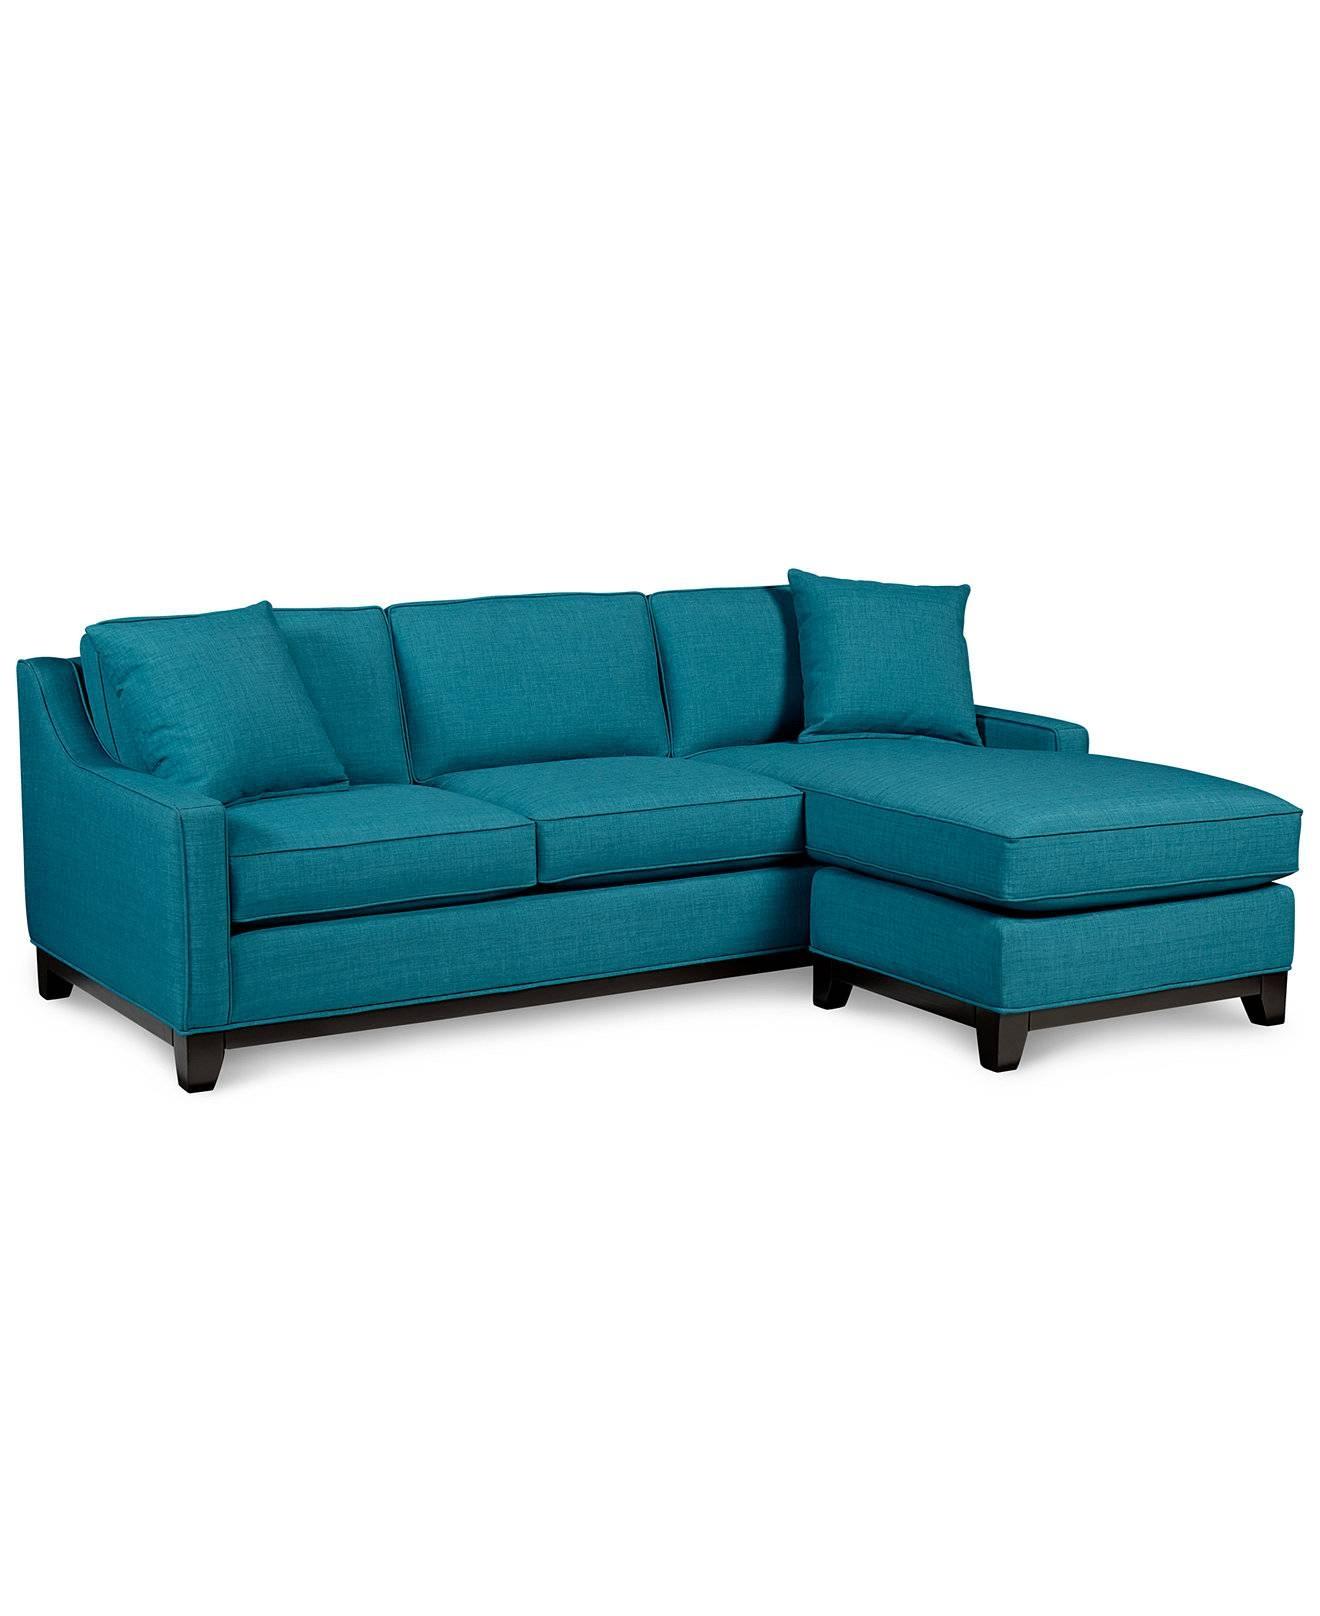 Macys Small Sofas | Tehranmix Decoration with regard to Macys Sofas (Image 17 of 25)